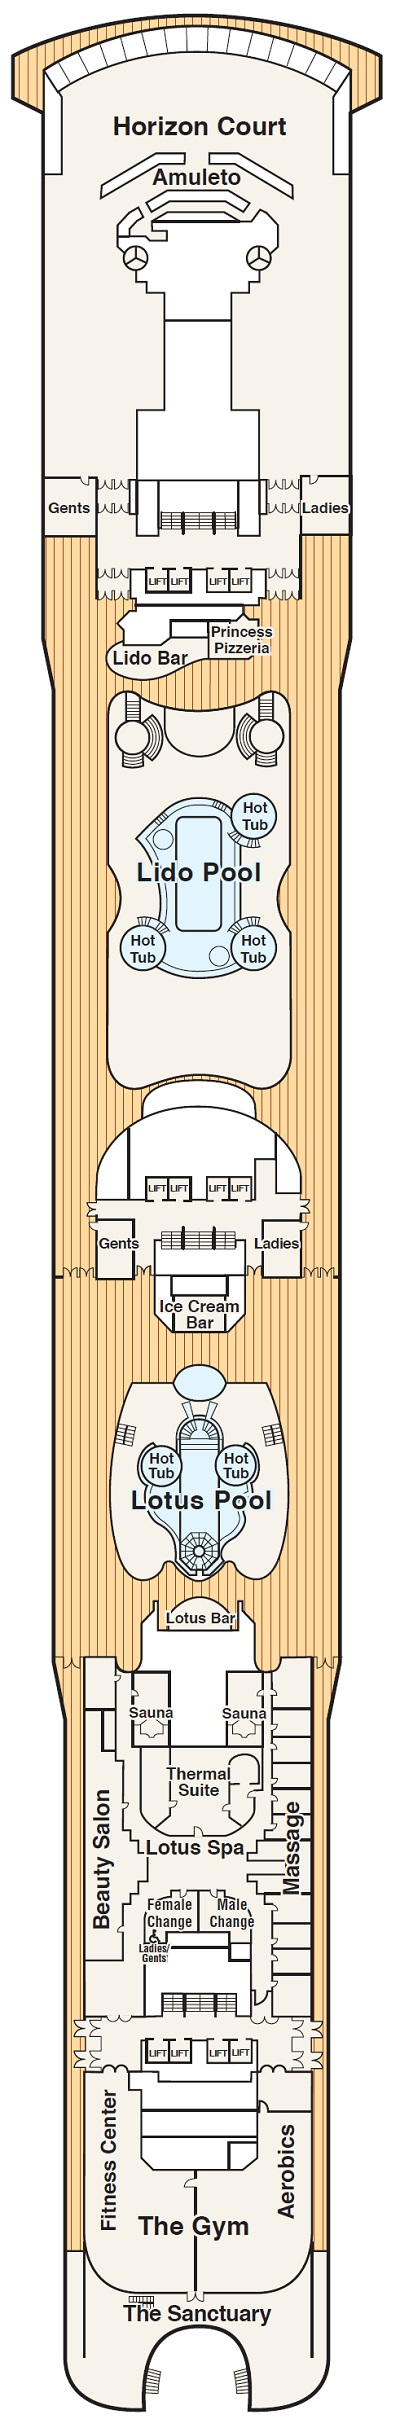 Deck 14 - Lido